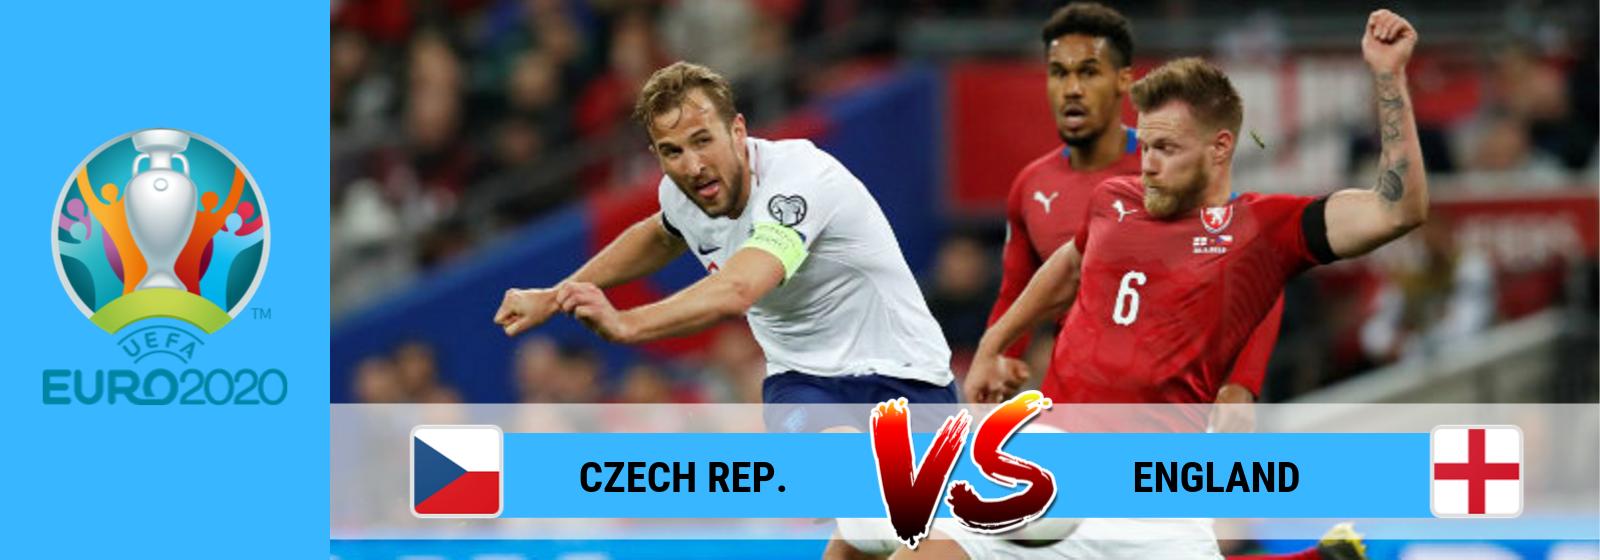 UEFA Euro 2020 Czech Republic Vs. England Asian Connect